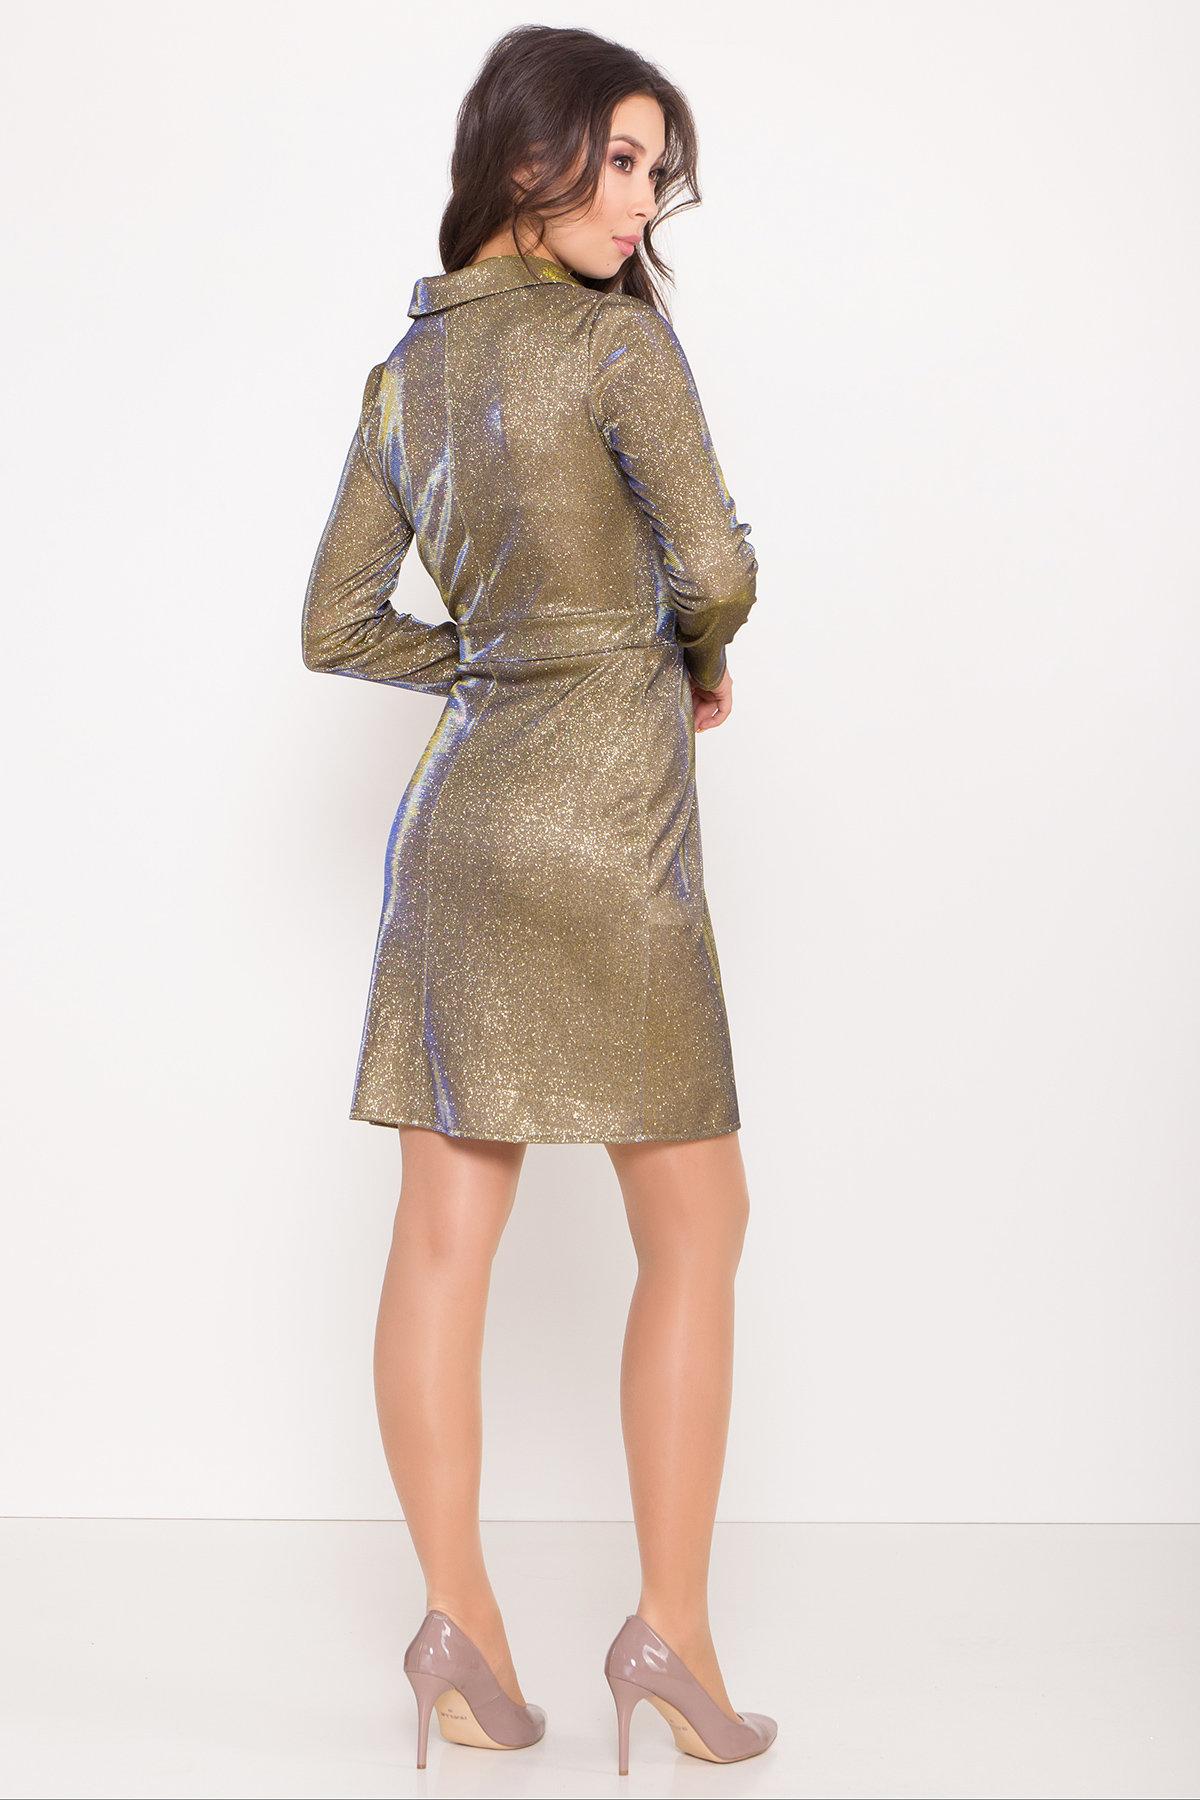 Платье Шати 8686 АРТ. 45015 Цвет: Золото/электрик - фото 5, интернет магазин tm-modus.ru